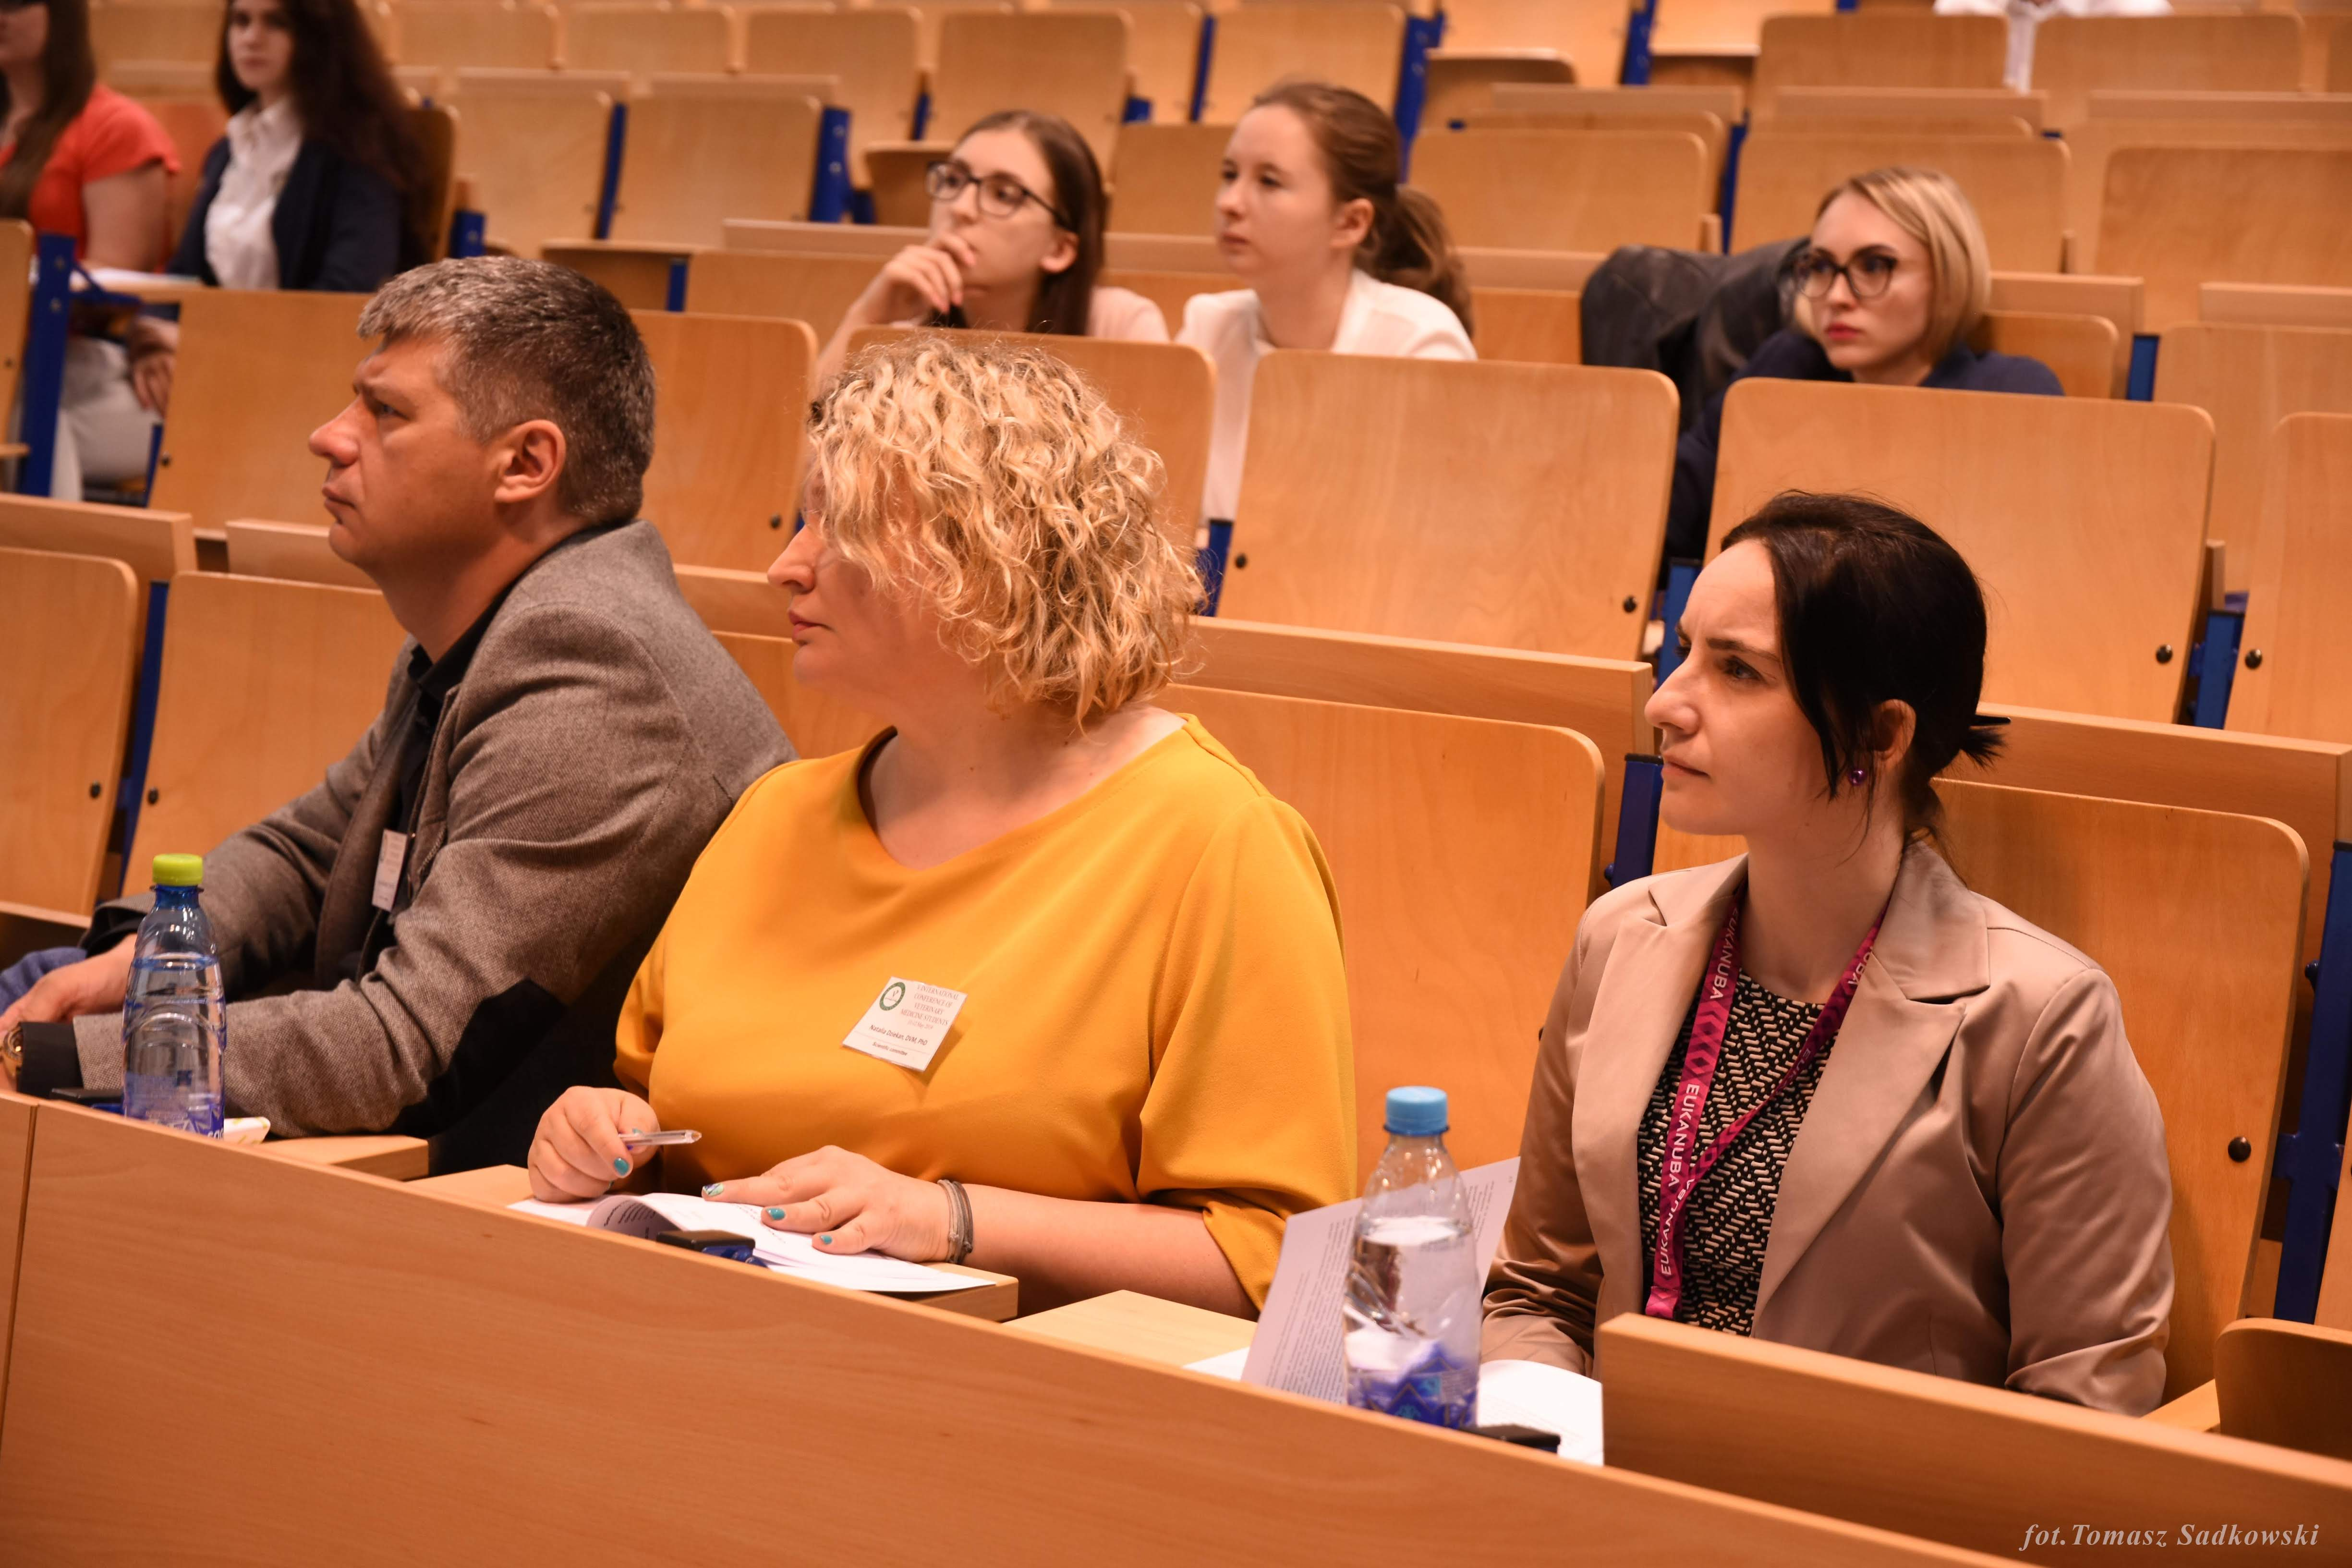 from the left Lucjan Witkowski DVM PhD, Natalia Dziekan DVM PhD, Izabella Dolka DVM PhD during farm animals session